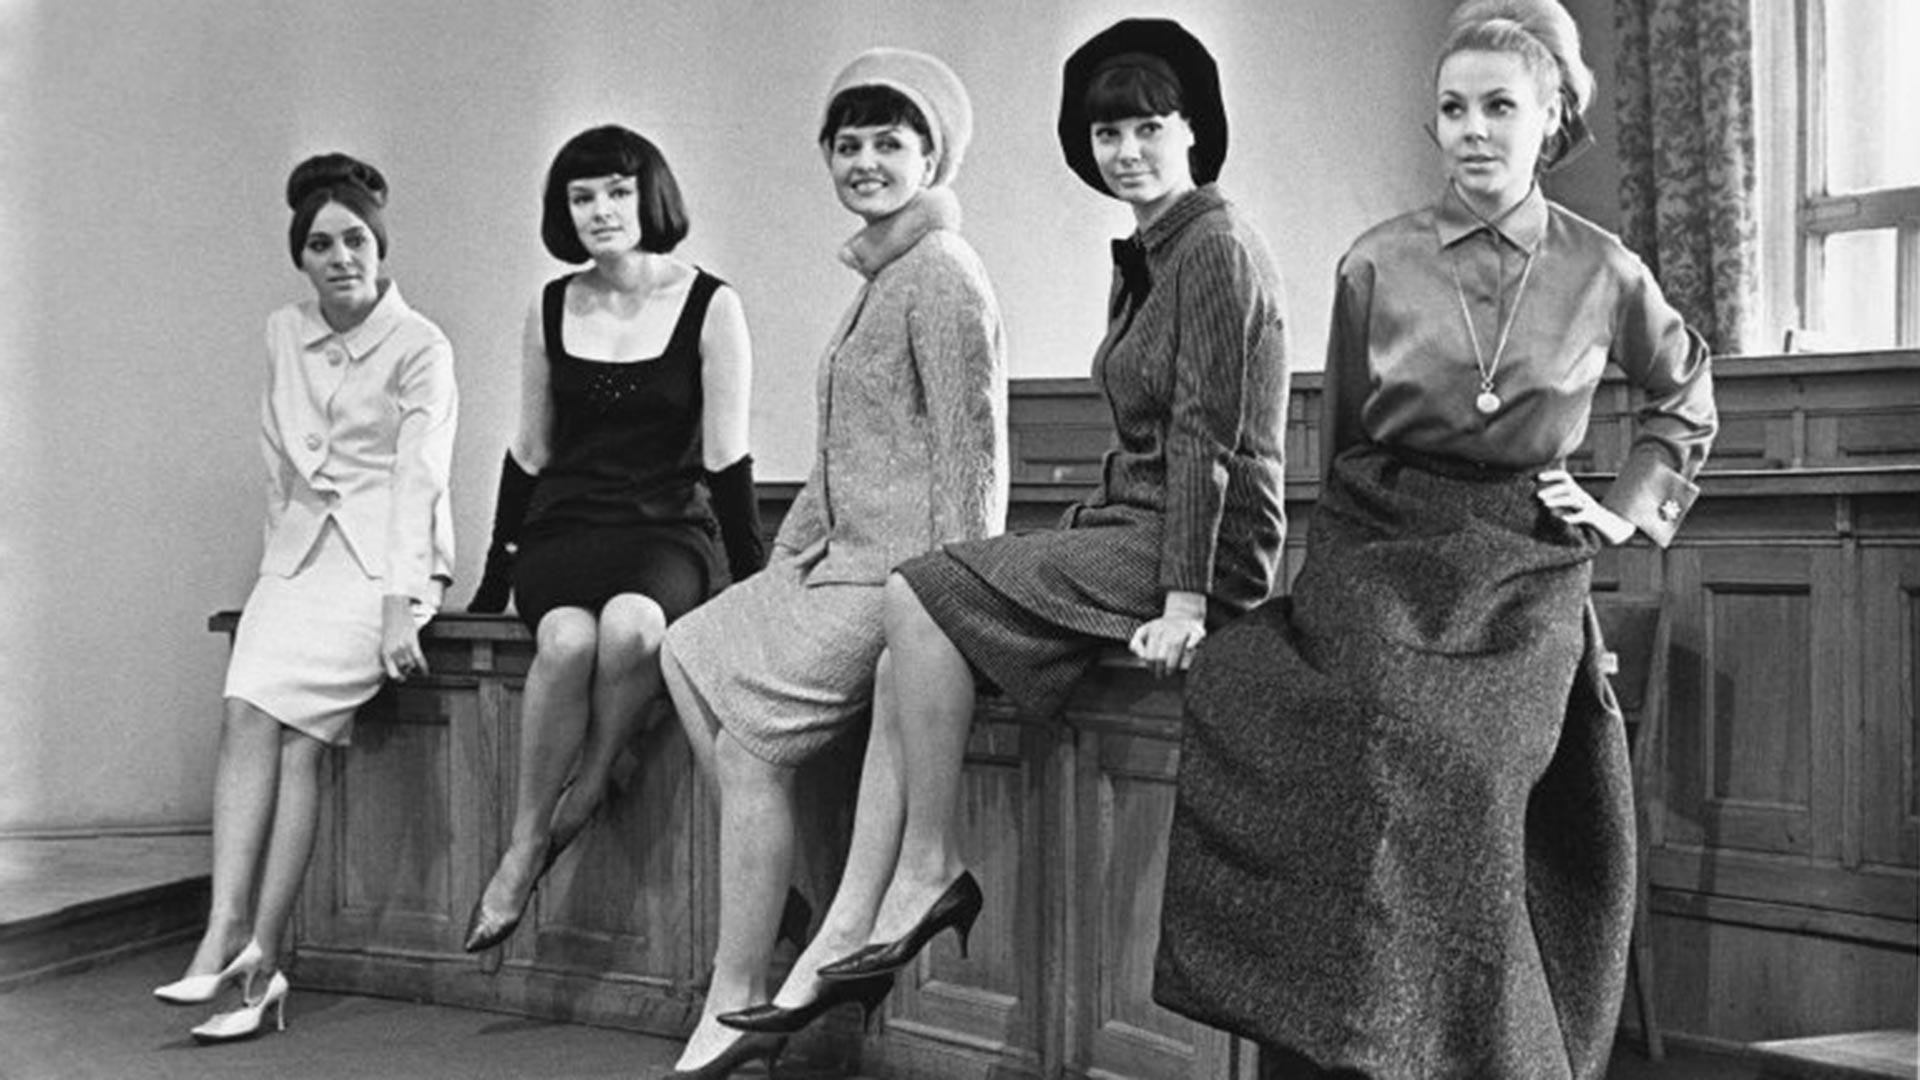 Allunionshaus für Modedesign. Modelle Natalja Kondraschina, Jelena Isorgina, Liliana Baskakowa, Regina Sbarskaja und Mila Romanowskaja, 1965.